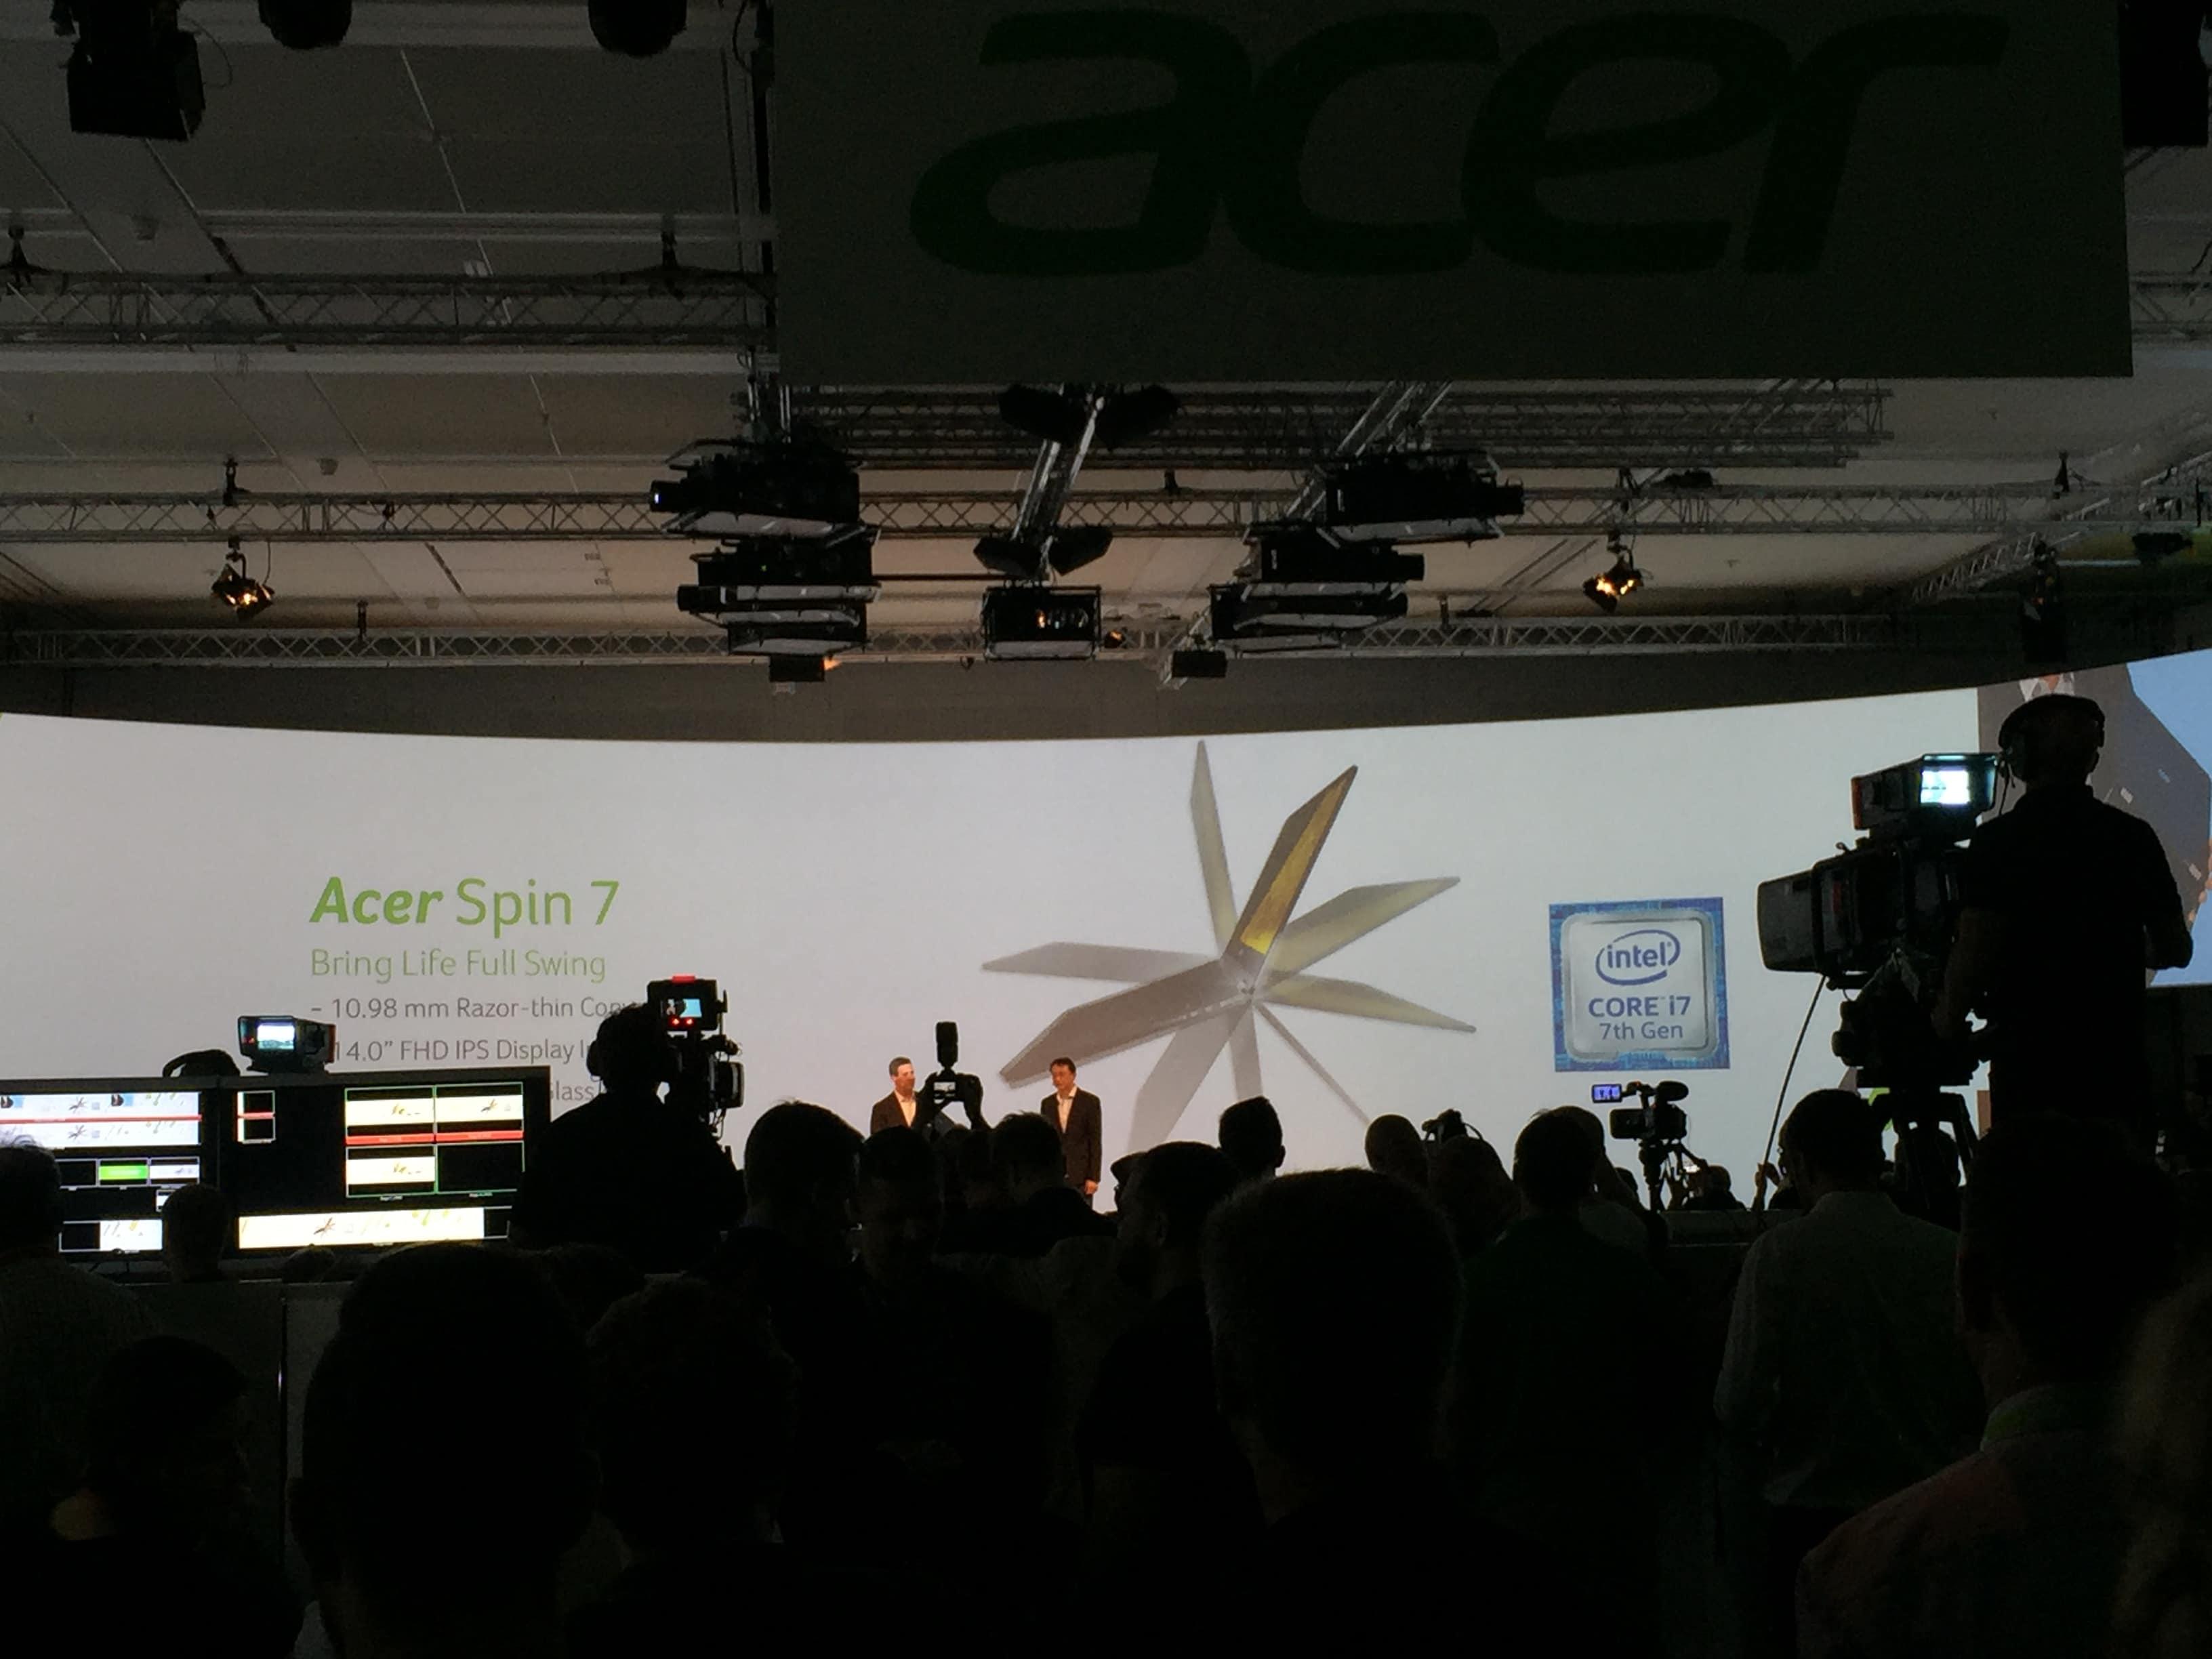 ifa acer spin 7 vorgestellt d nnstes convertible mit neuem intel prozessor. Black Bedroom Furniture Sets. Home Design Ideas